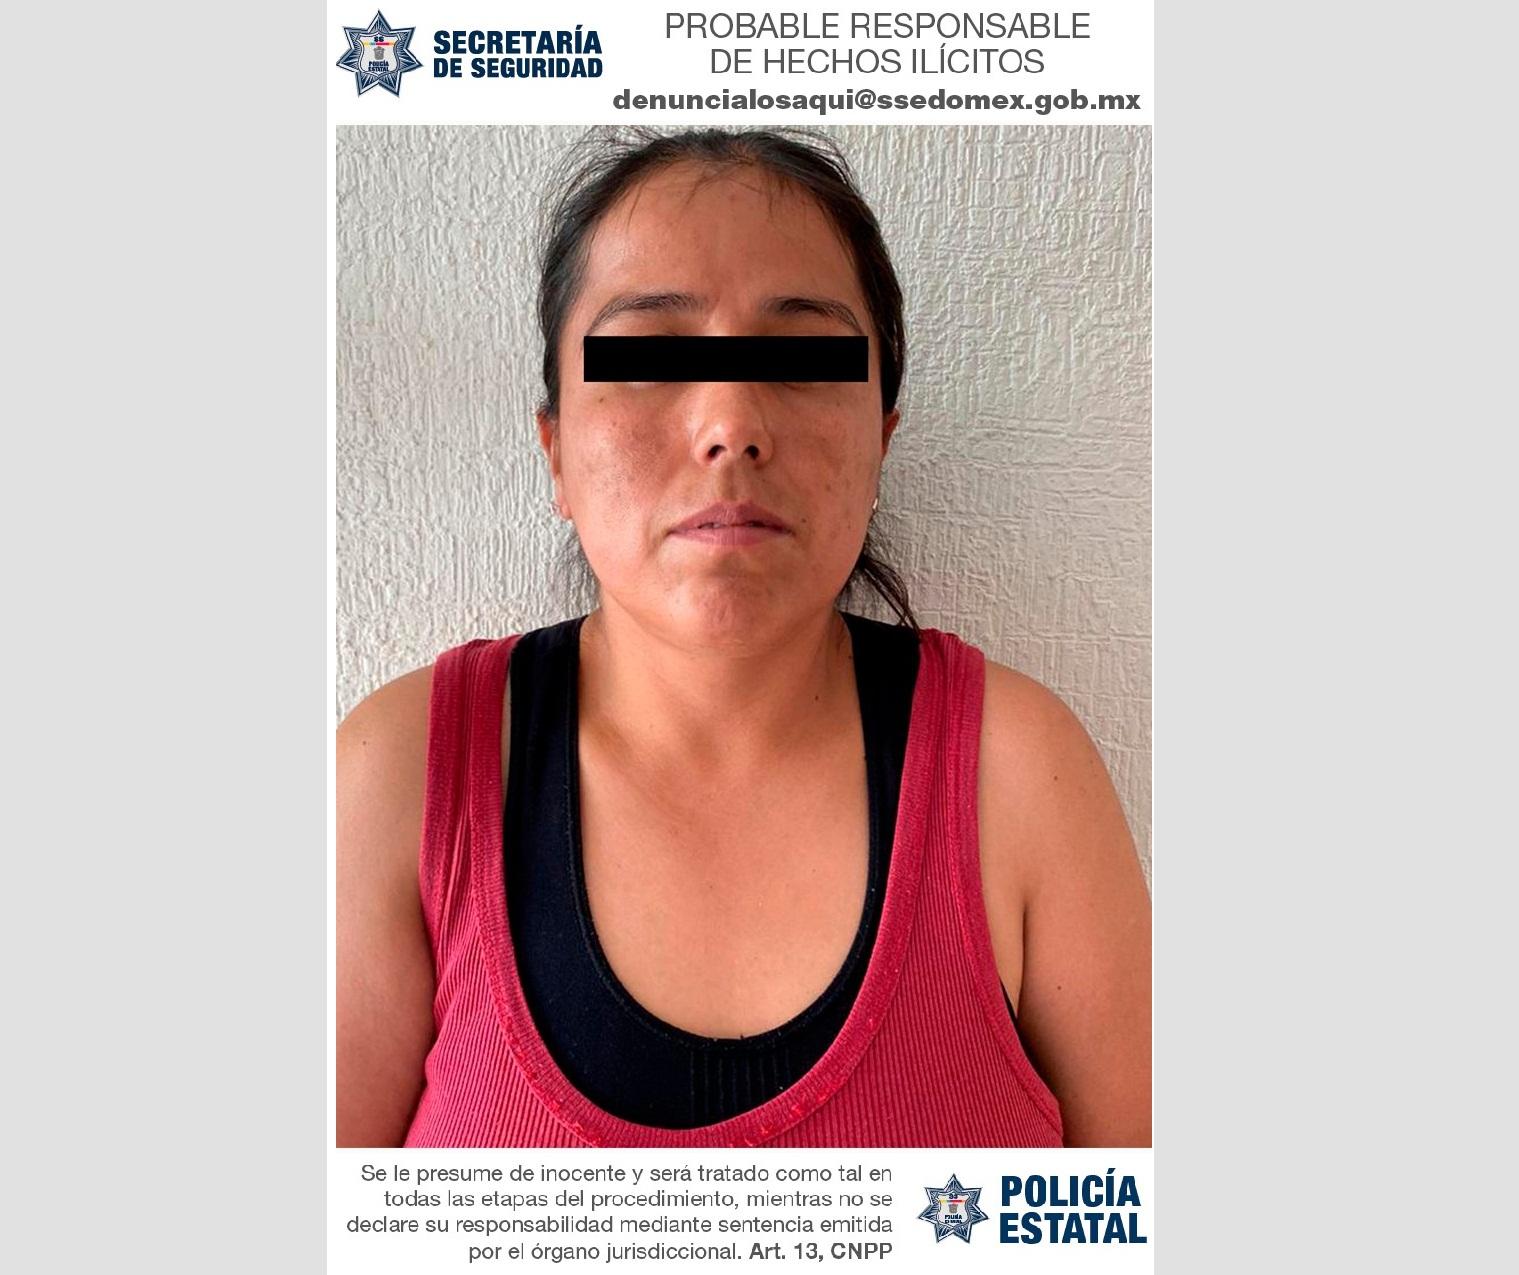 RECUPERAN VEHÍCULO CON REPORTE DE ROBO EN TECAMAC